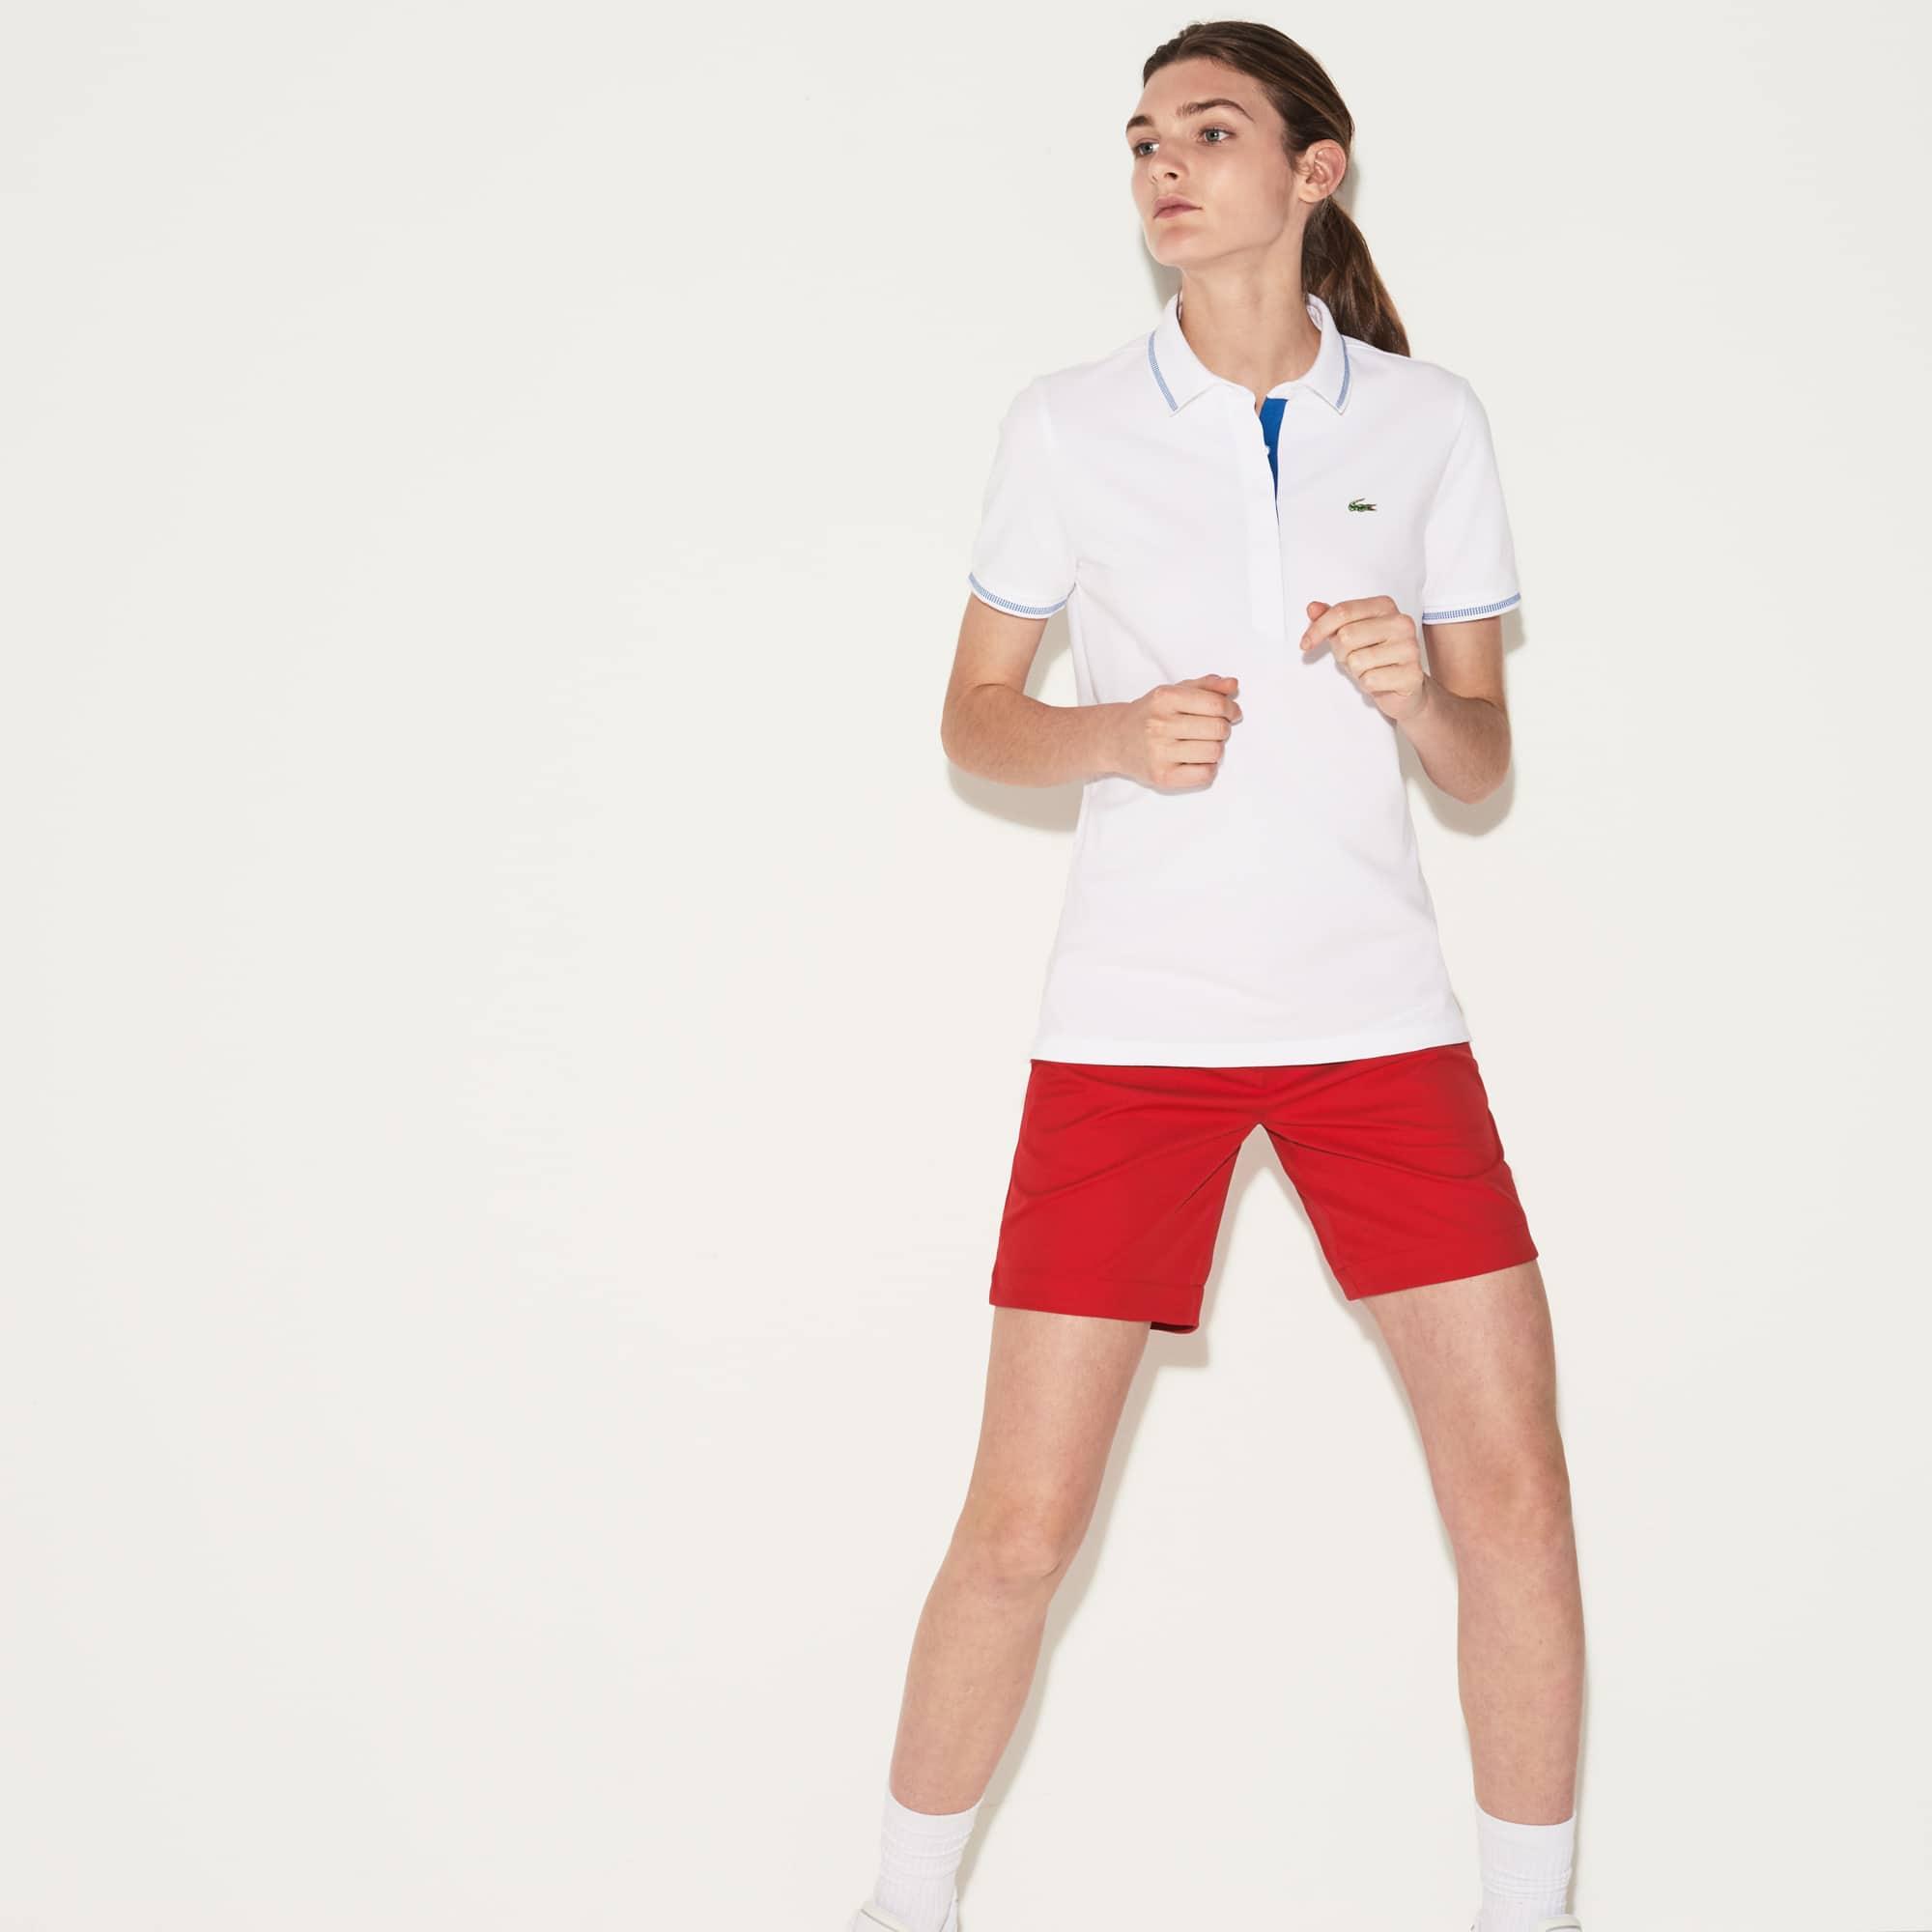 Lacoste SPORT Golf-polo dames technisch katoen met lichte stretch